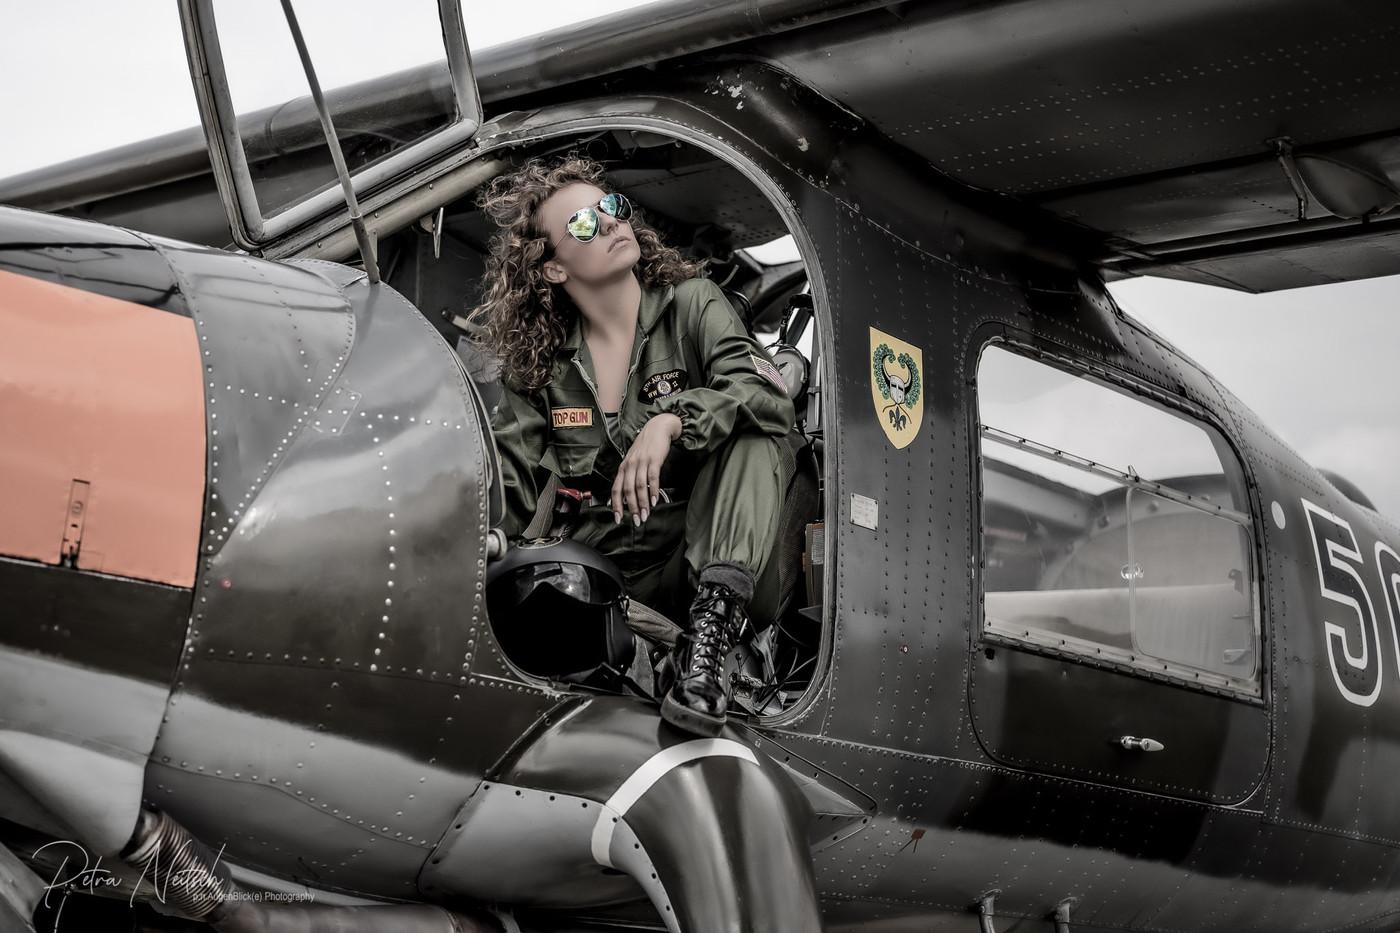 09-2019-Planes Girls and Rockn Roll-65.j